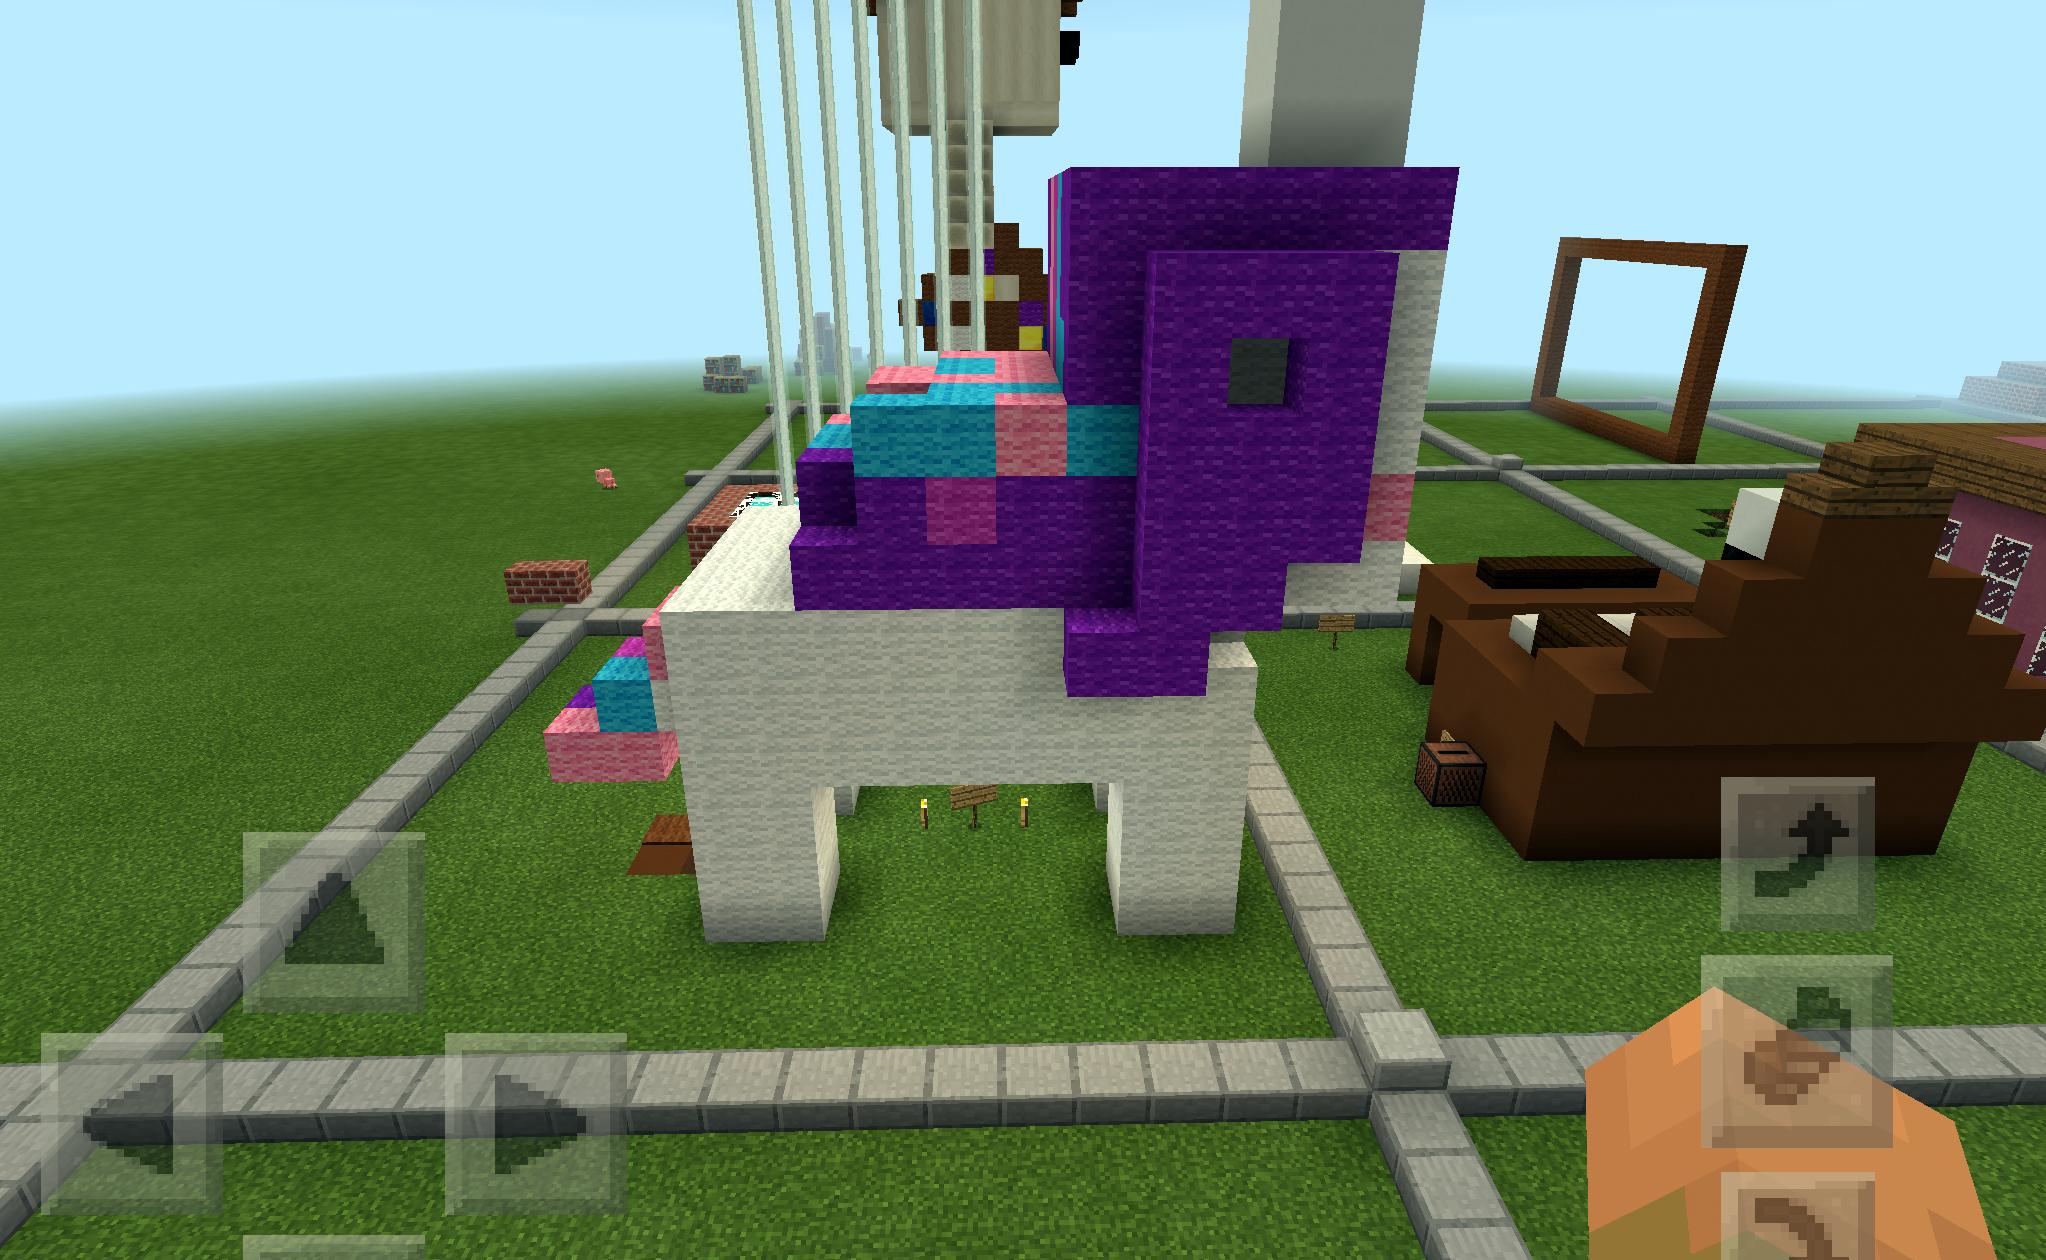 Meet Minecrafter Trini!